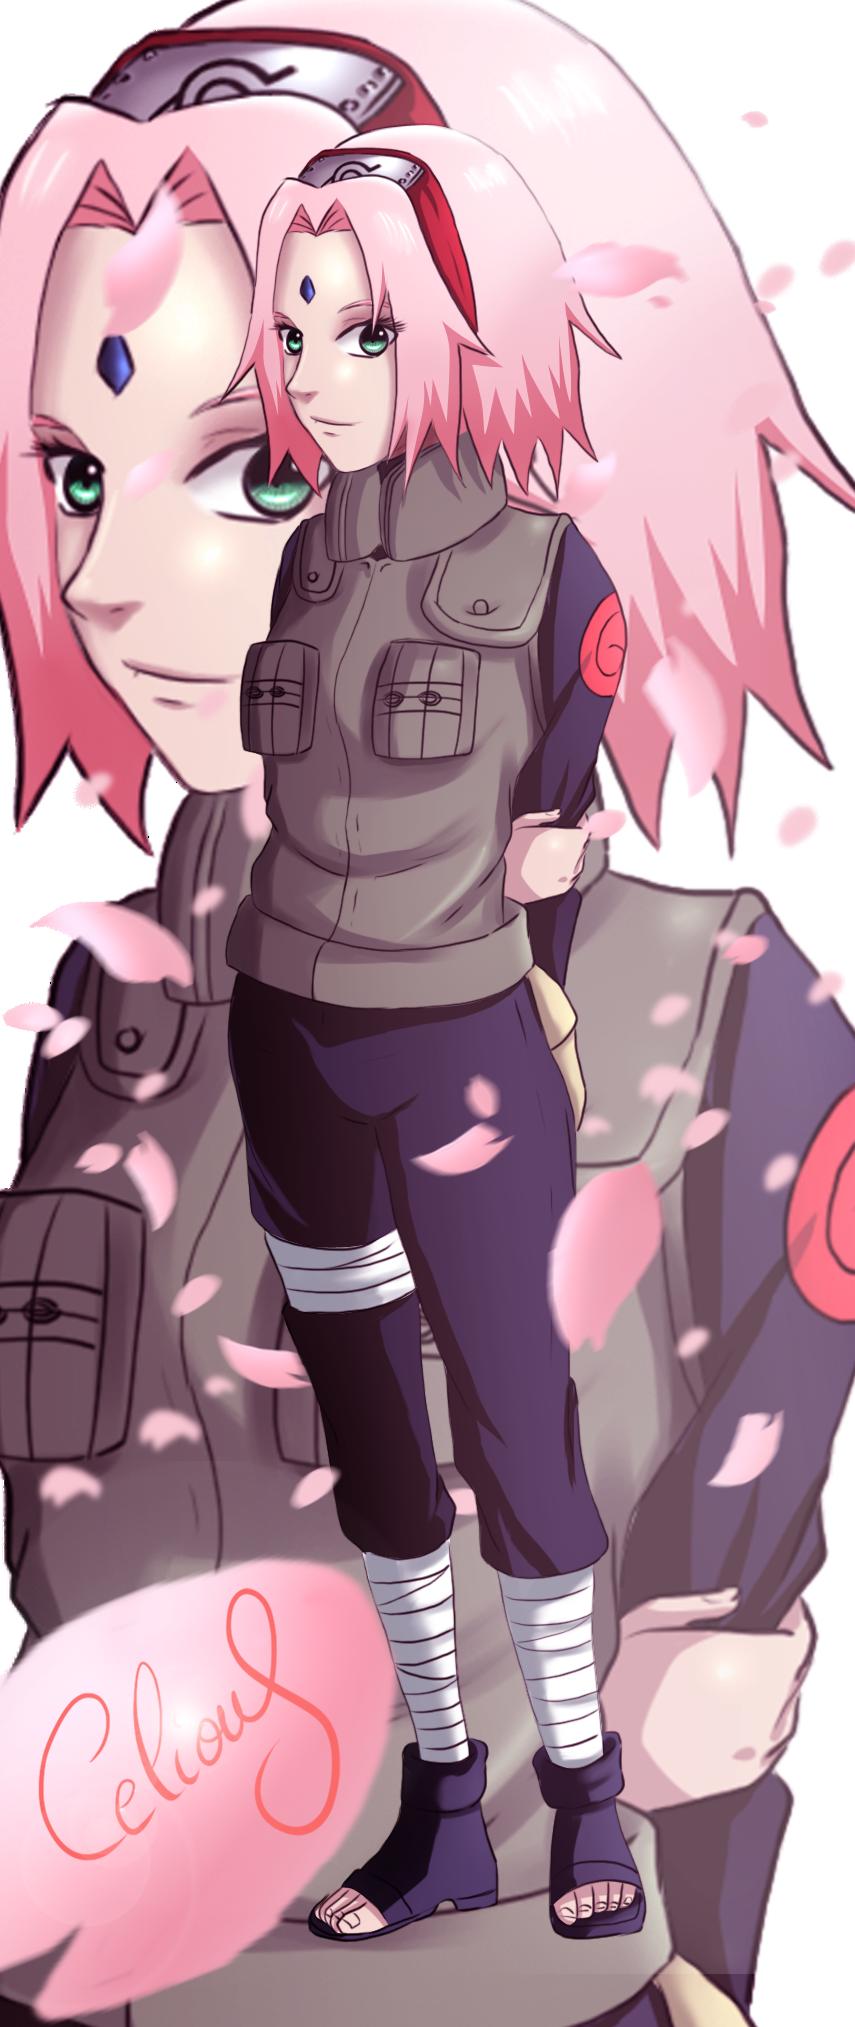 Sakura Shippuden War Sakura : War Outfit by...